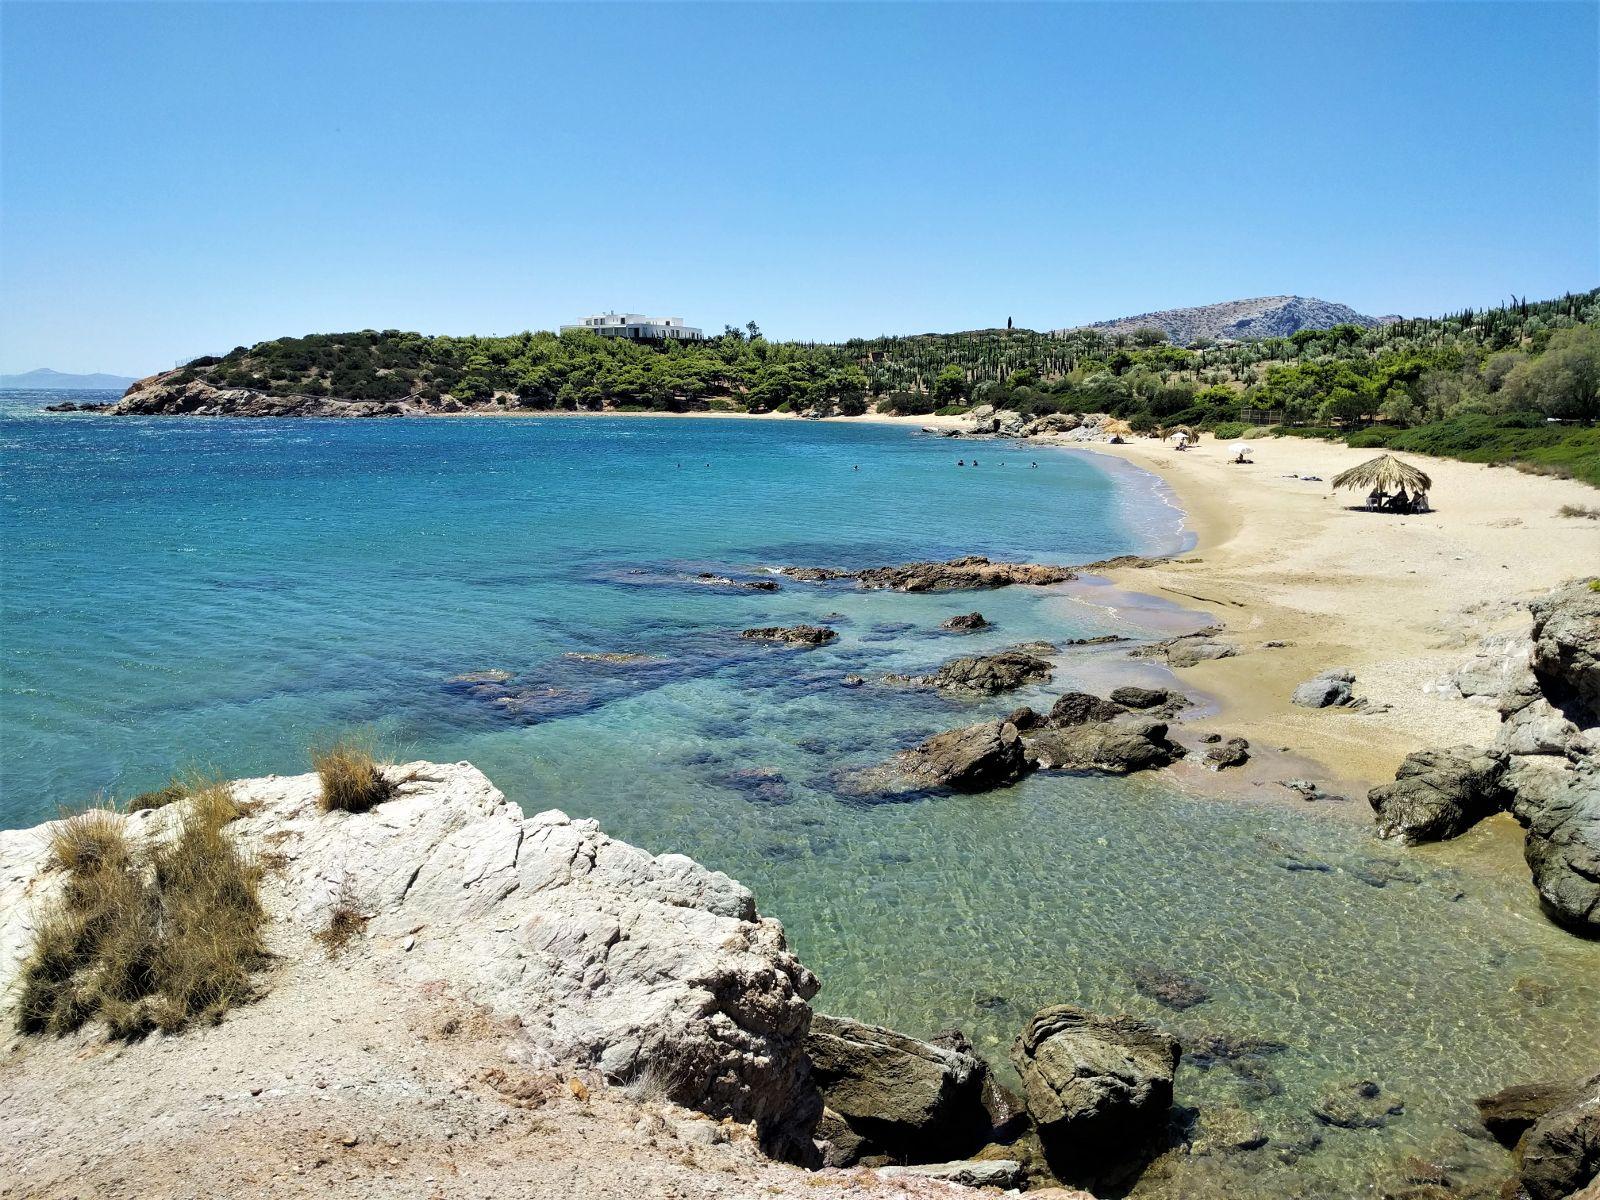 The most well-known… hidden beach of Attica, Legrena. Source: Truevoyagers